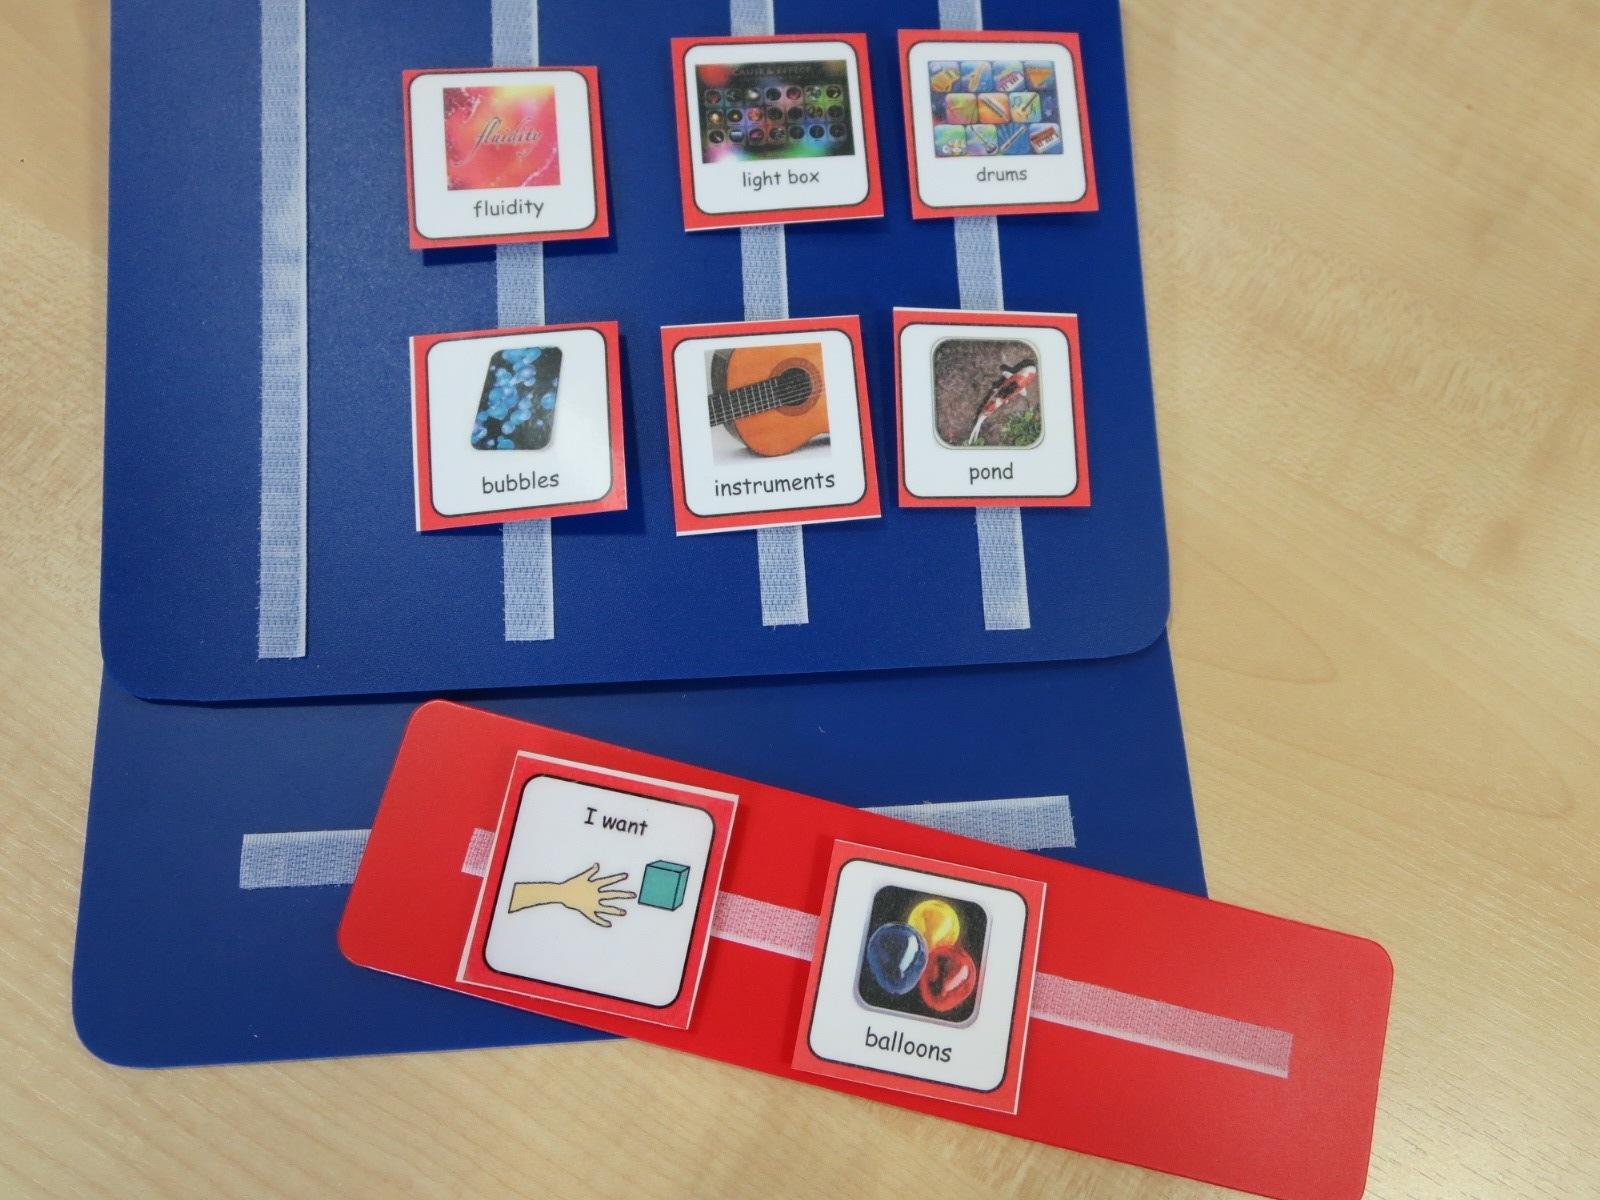 Autism Picture Exchange Communication System